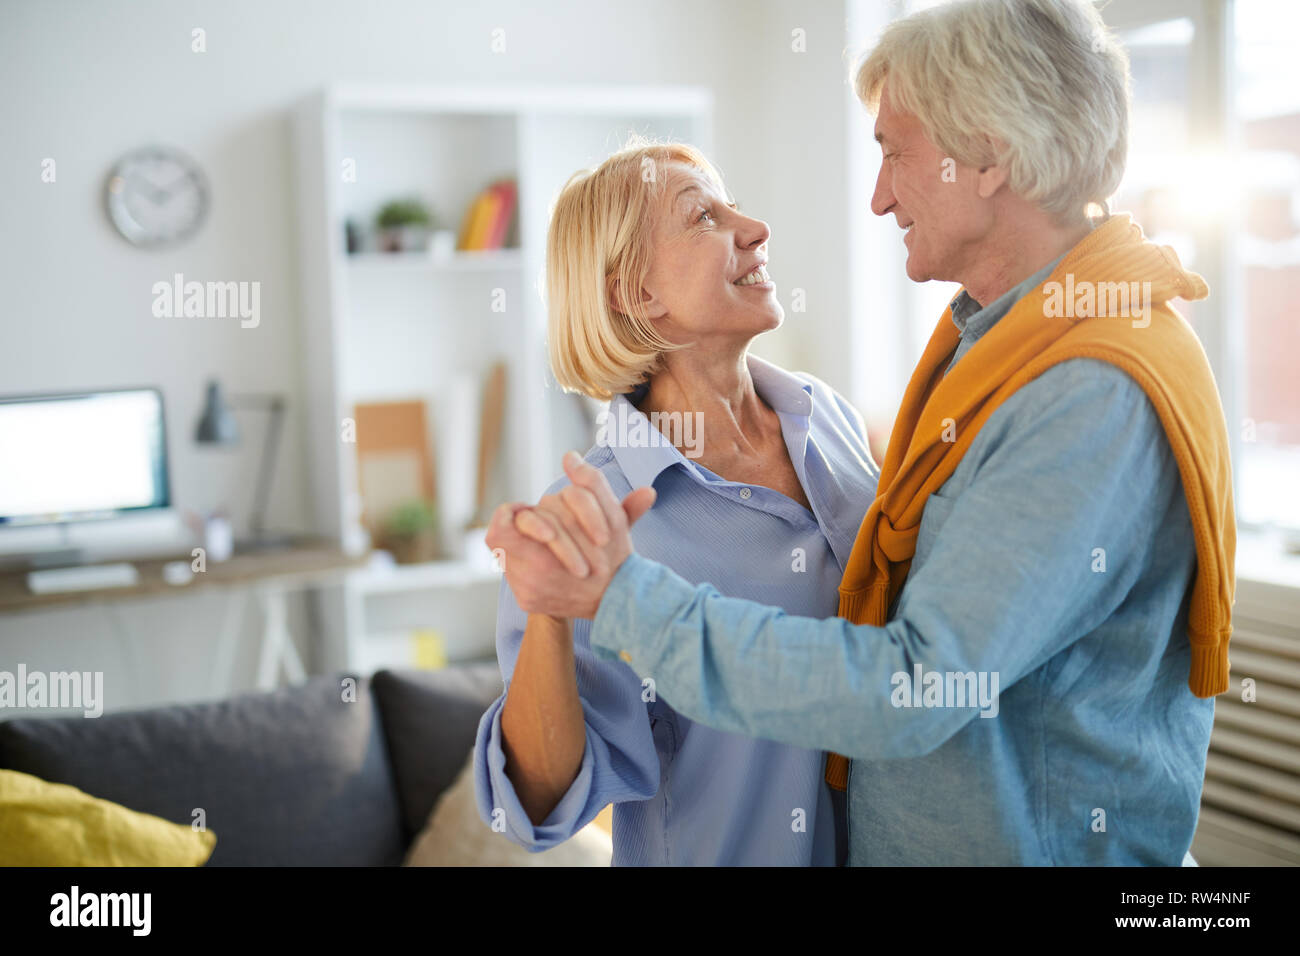 Reifes Paar tanzen zu Hause Stockfoto